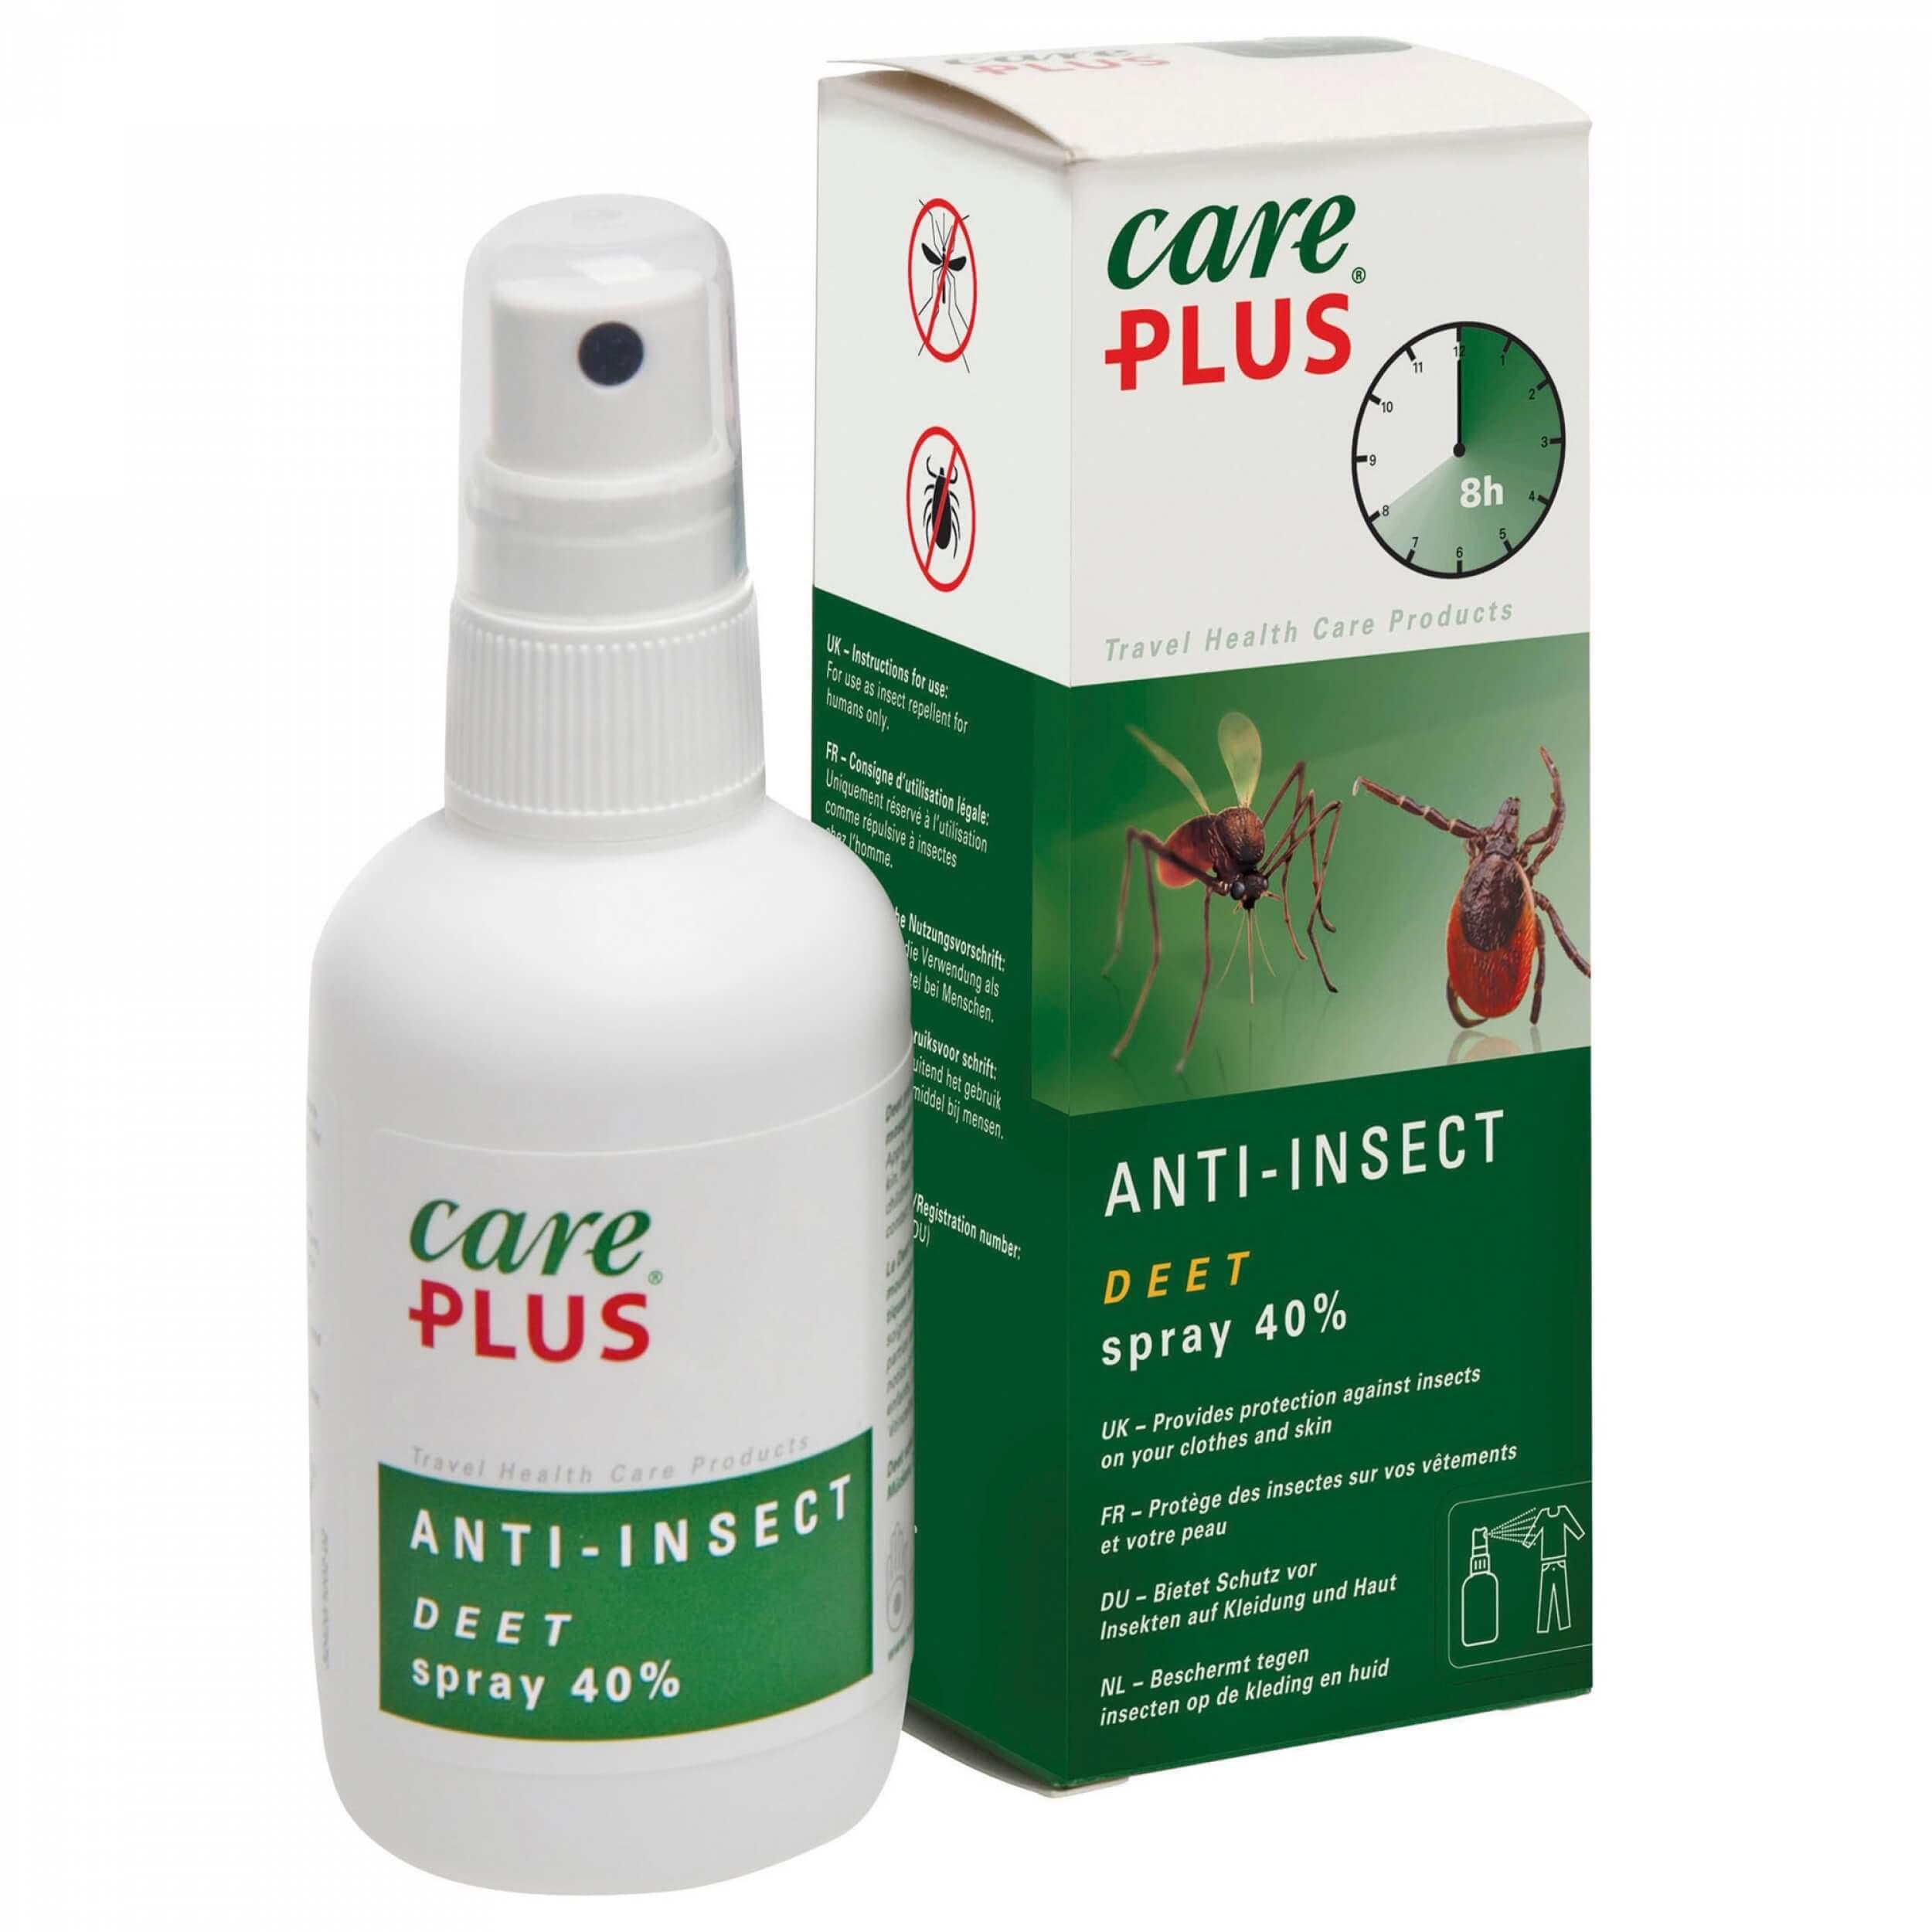 CarePlus Anti-Insect Deet 40%, 60ml